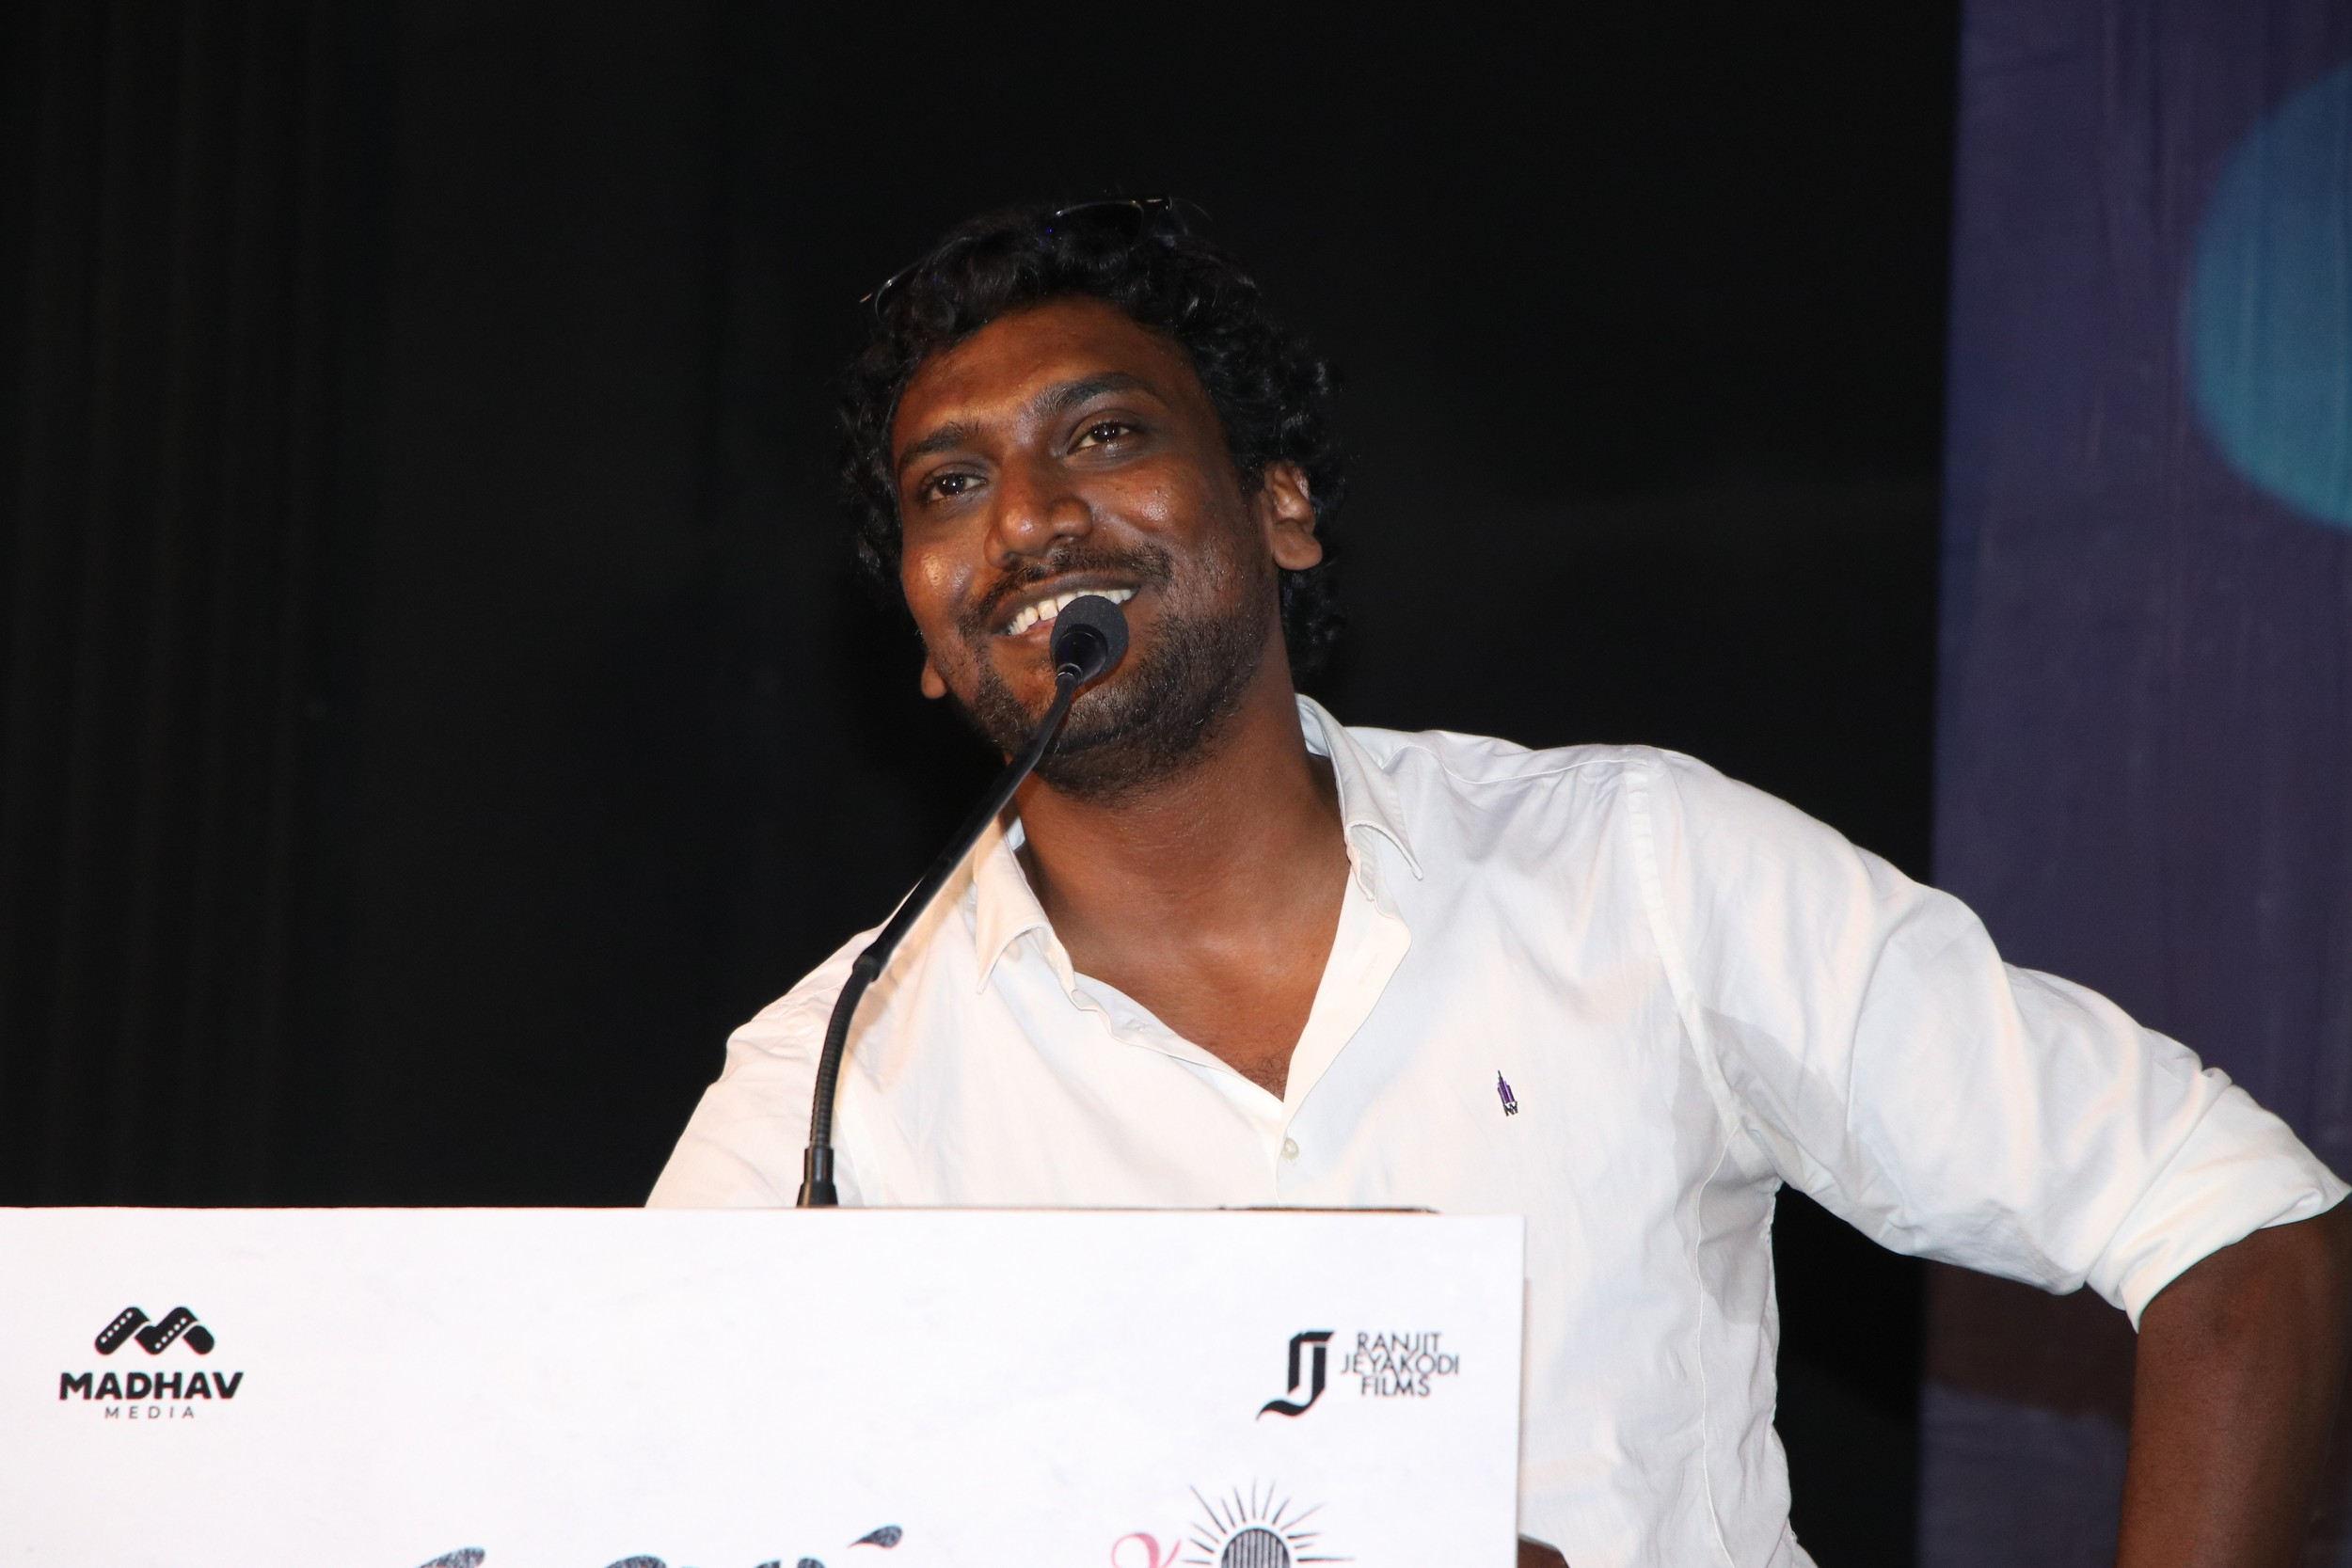 Director Ranjit Jeyakodi about Ispade Rajavum Idhaya Raniyum